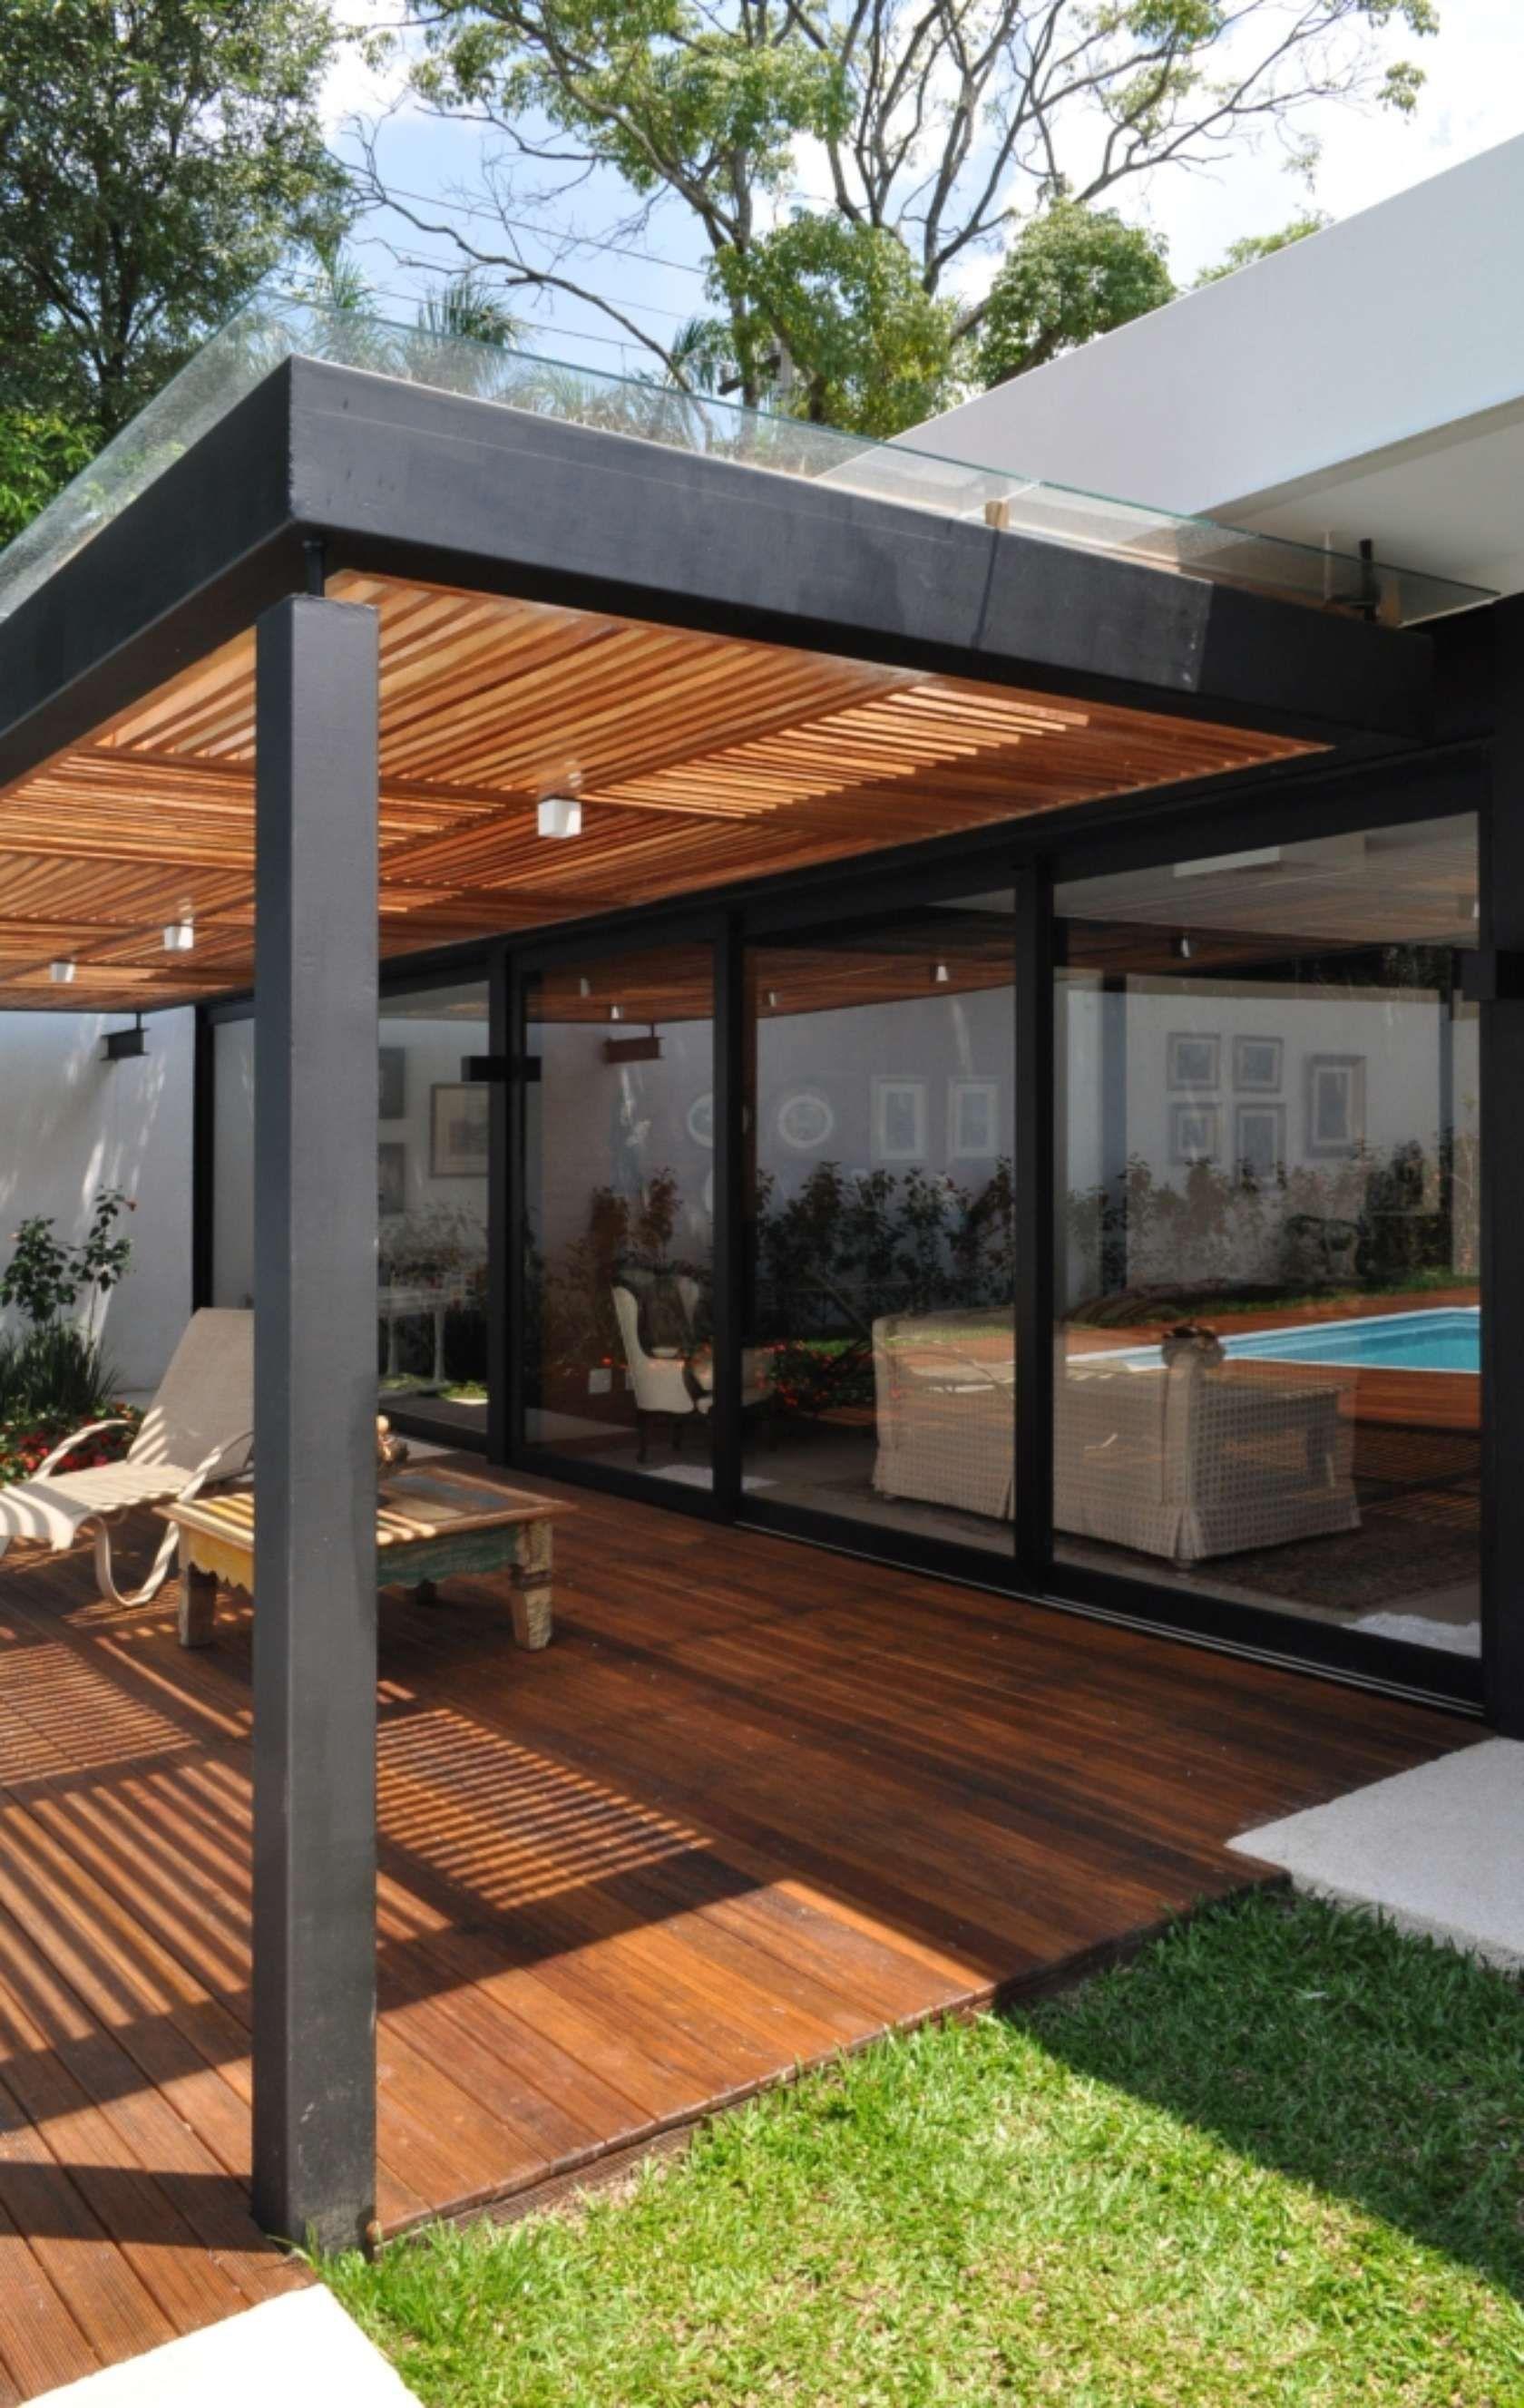 Casa m casa en 2019 dise o de terraza p rgolas y - Pergolas para terraza ...